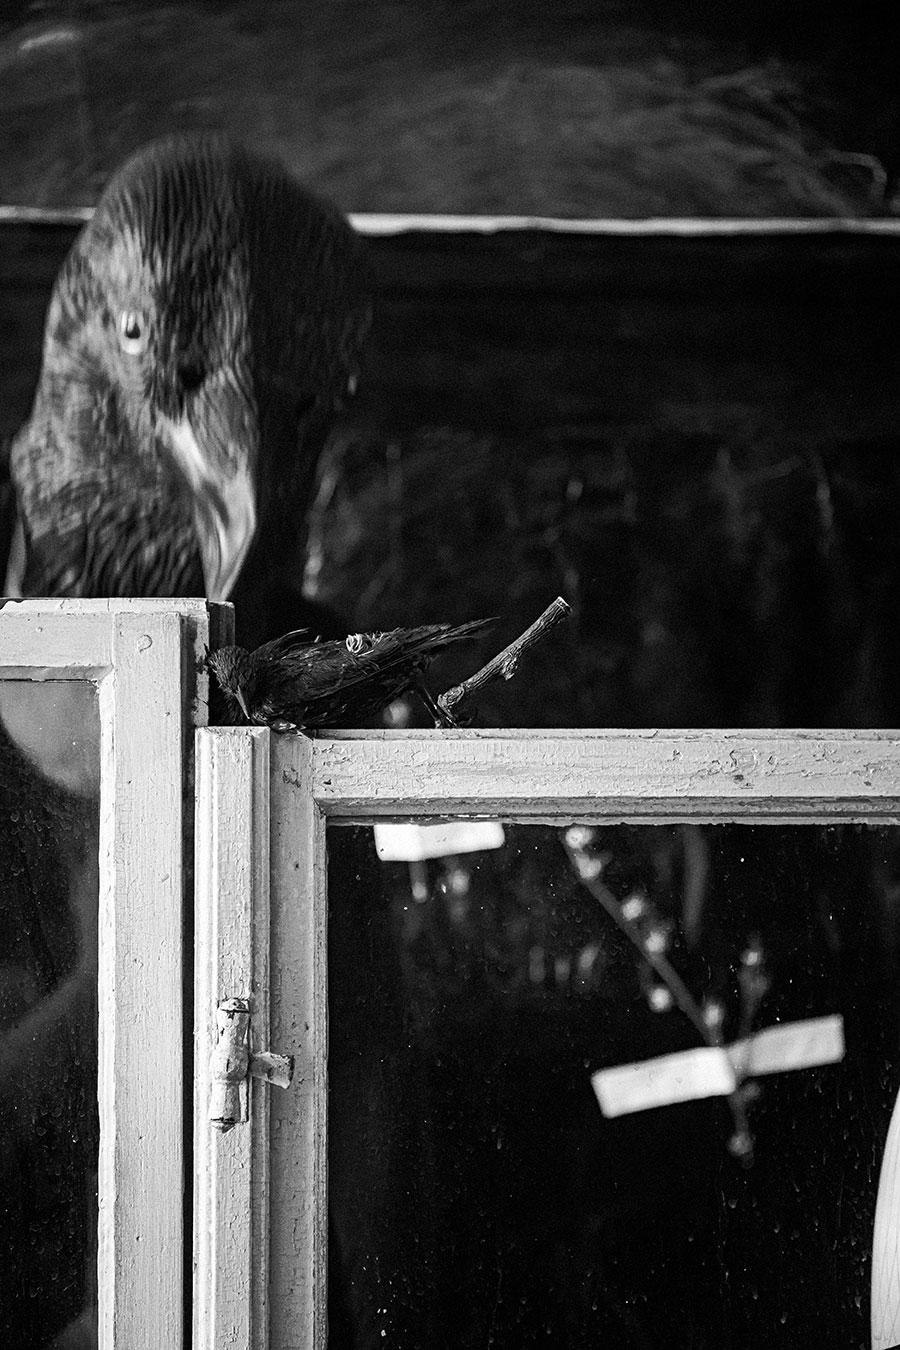 hinterdenfenstern_derrabe_antjekroeger4